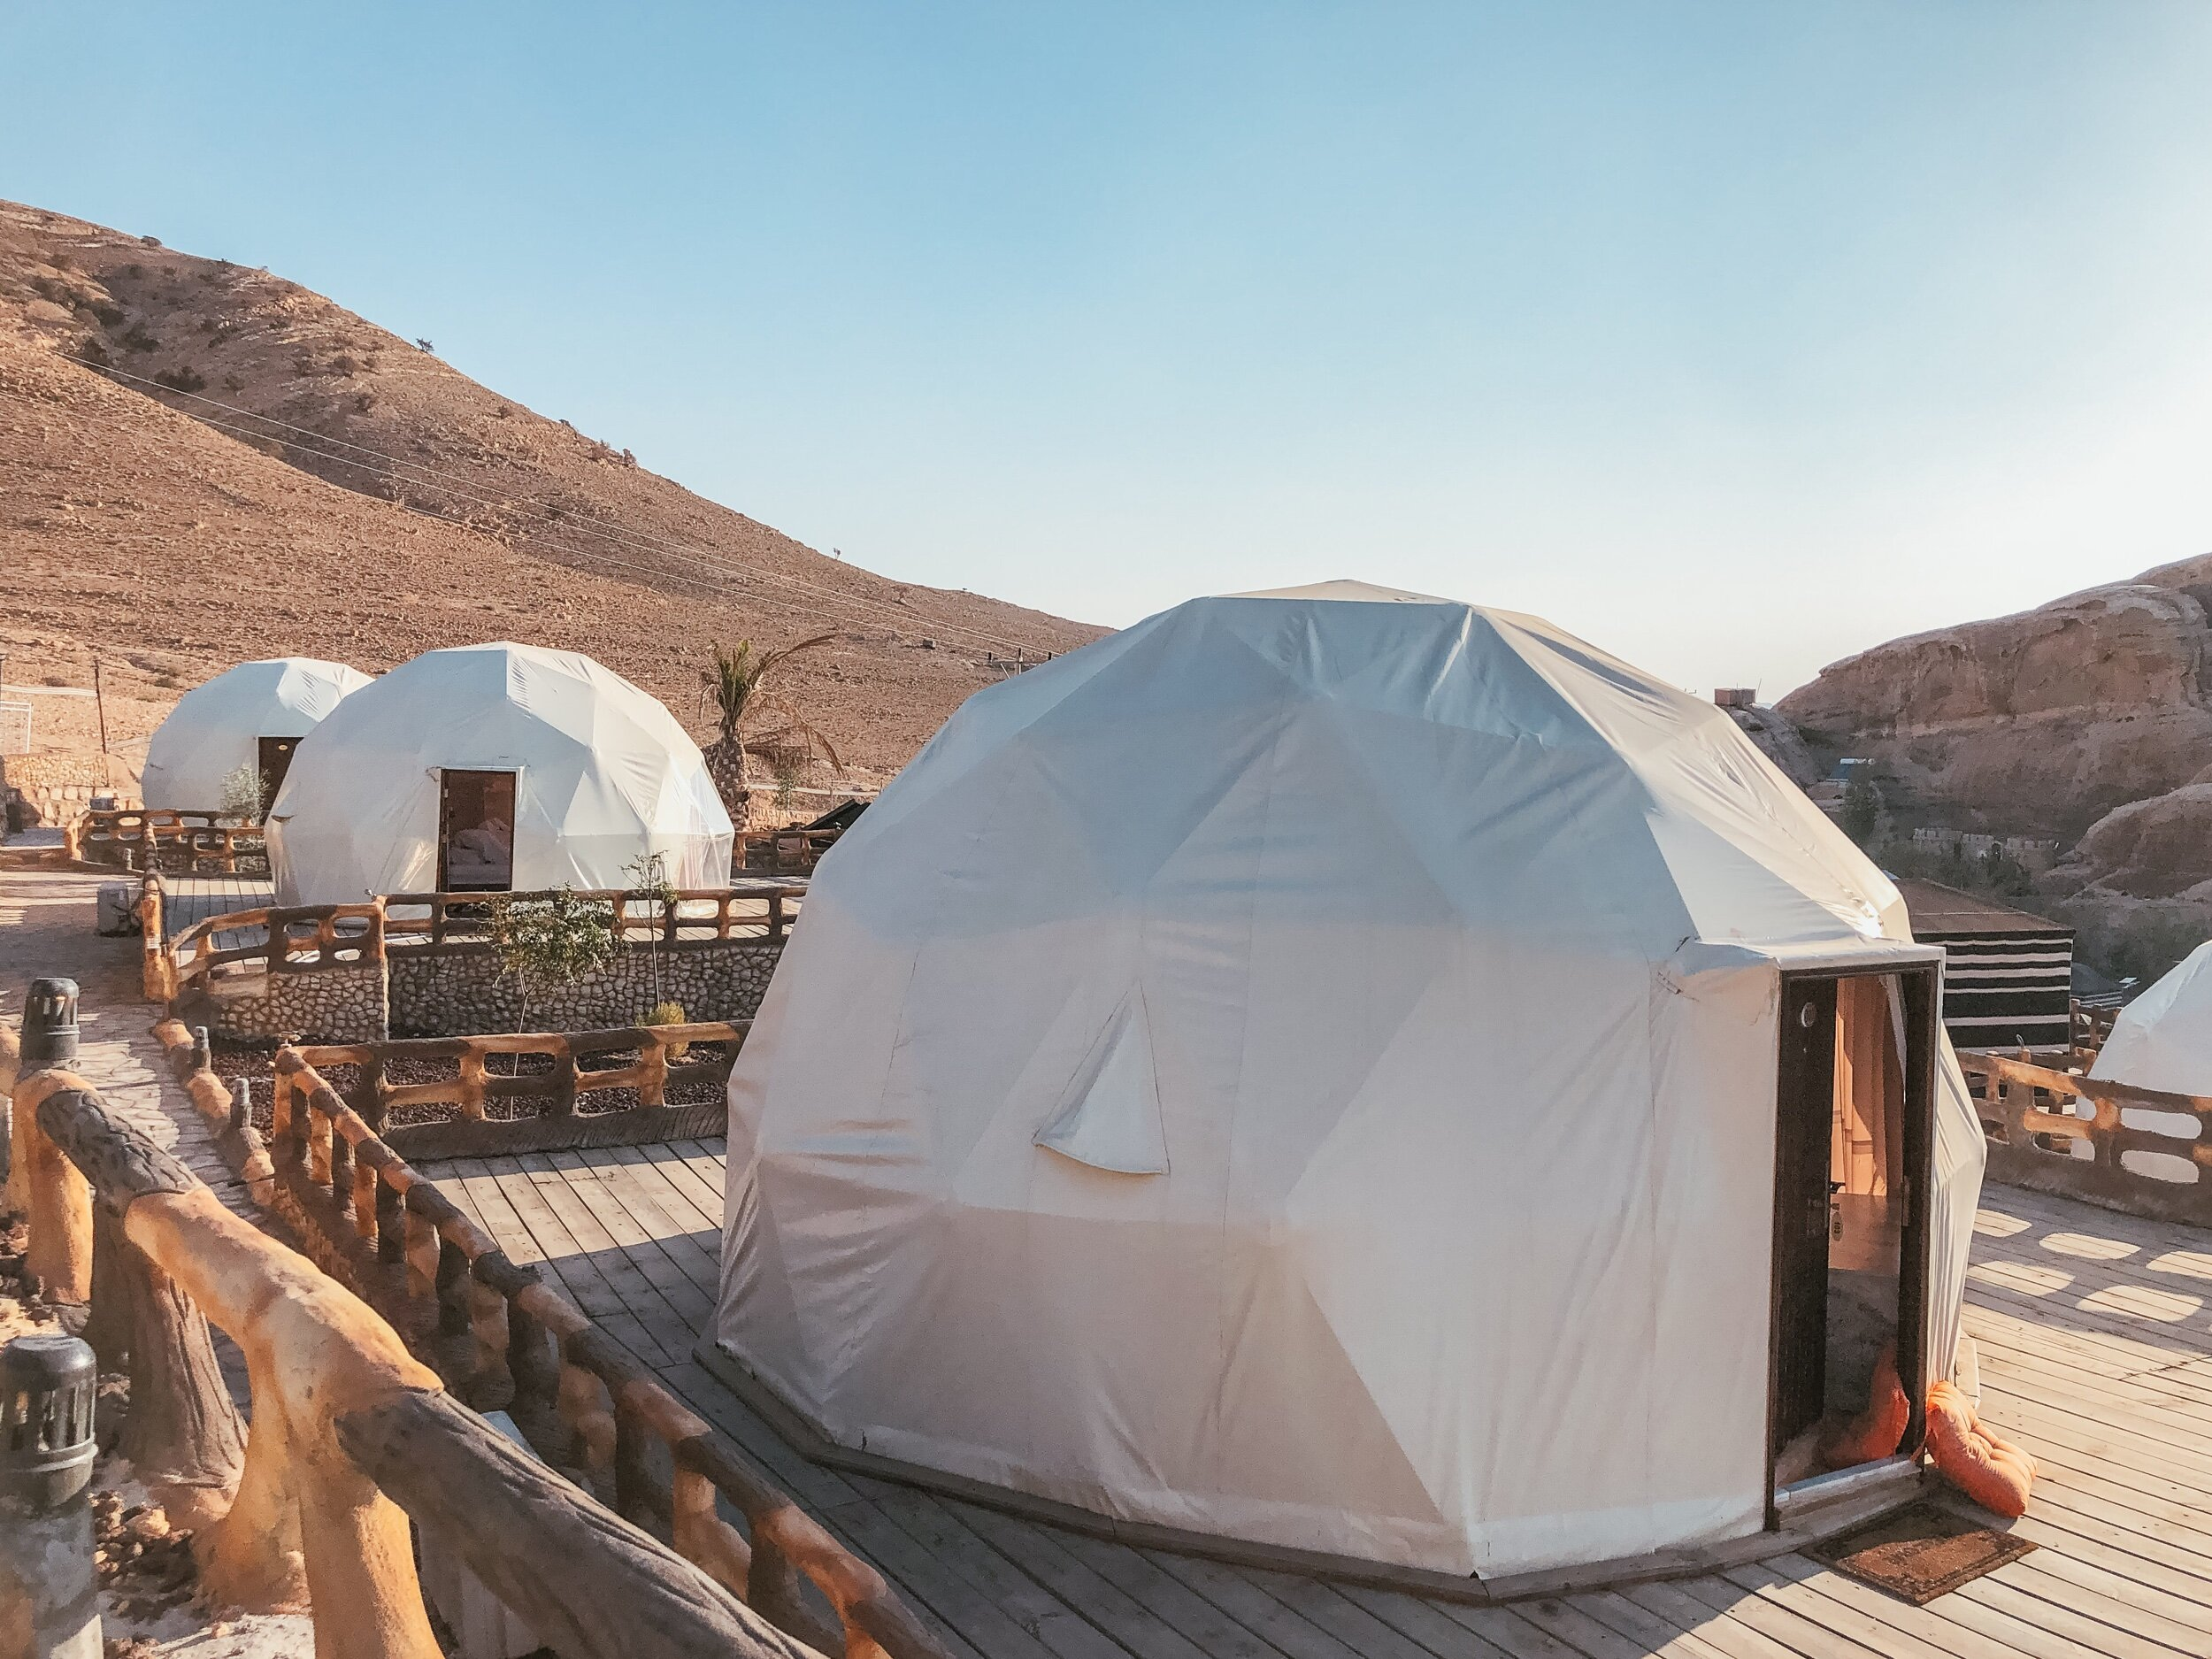 7 Wonders luxury camp was amazing.